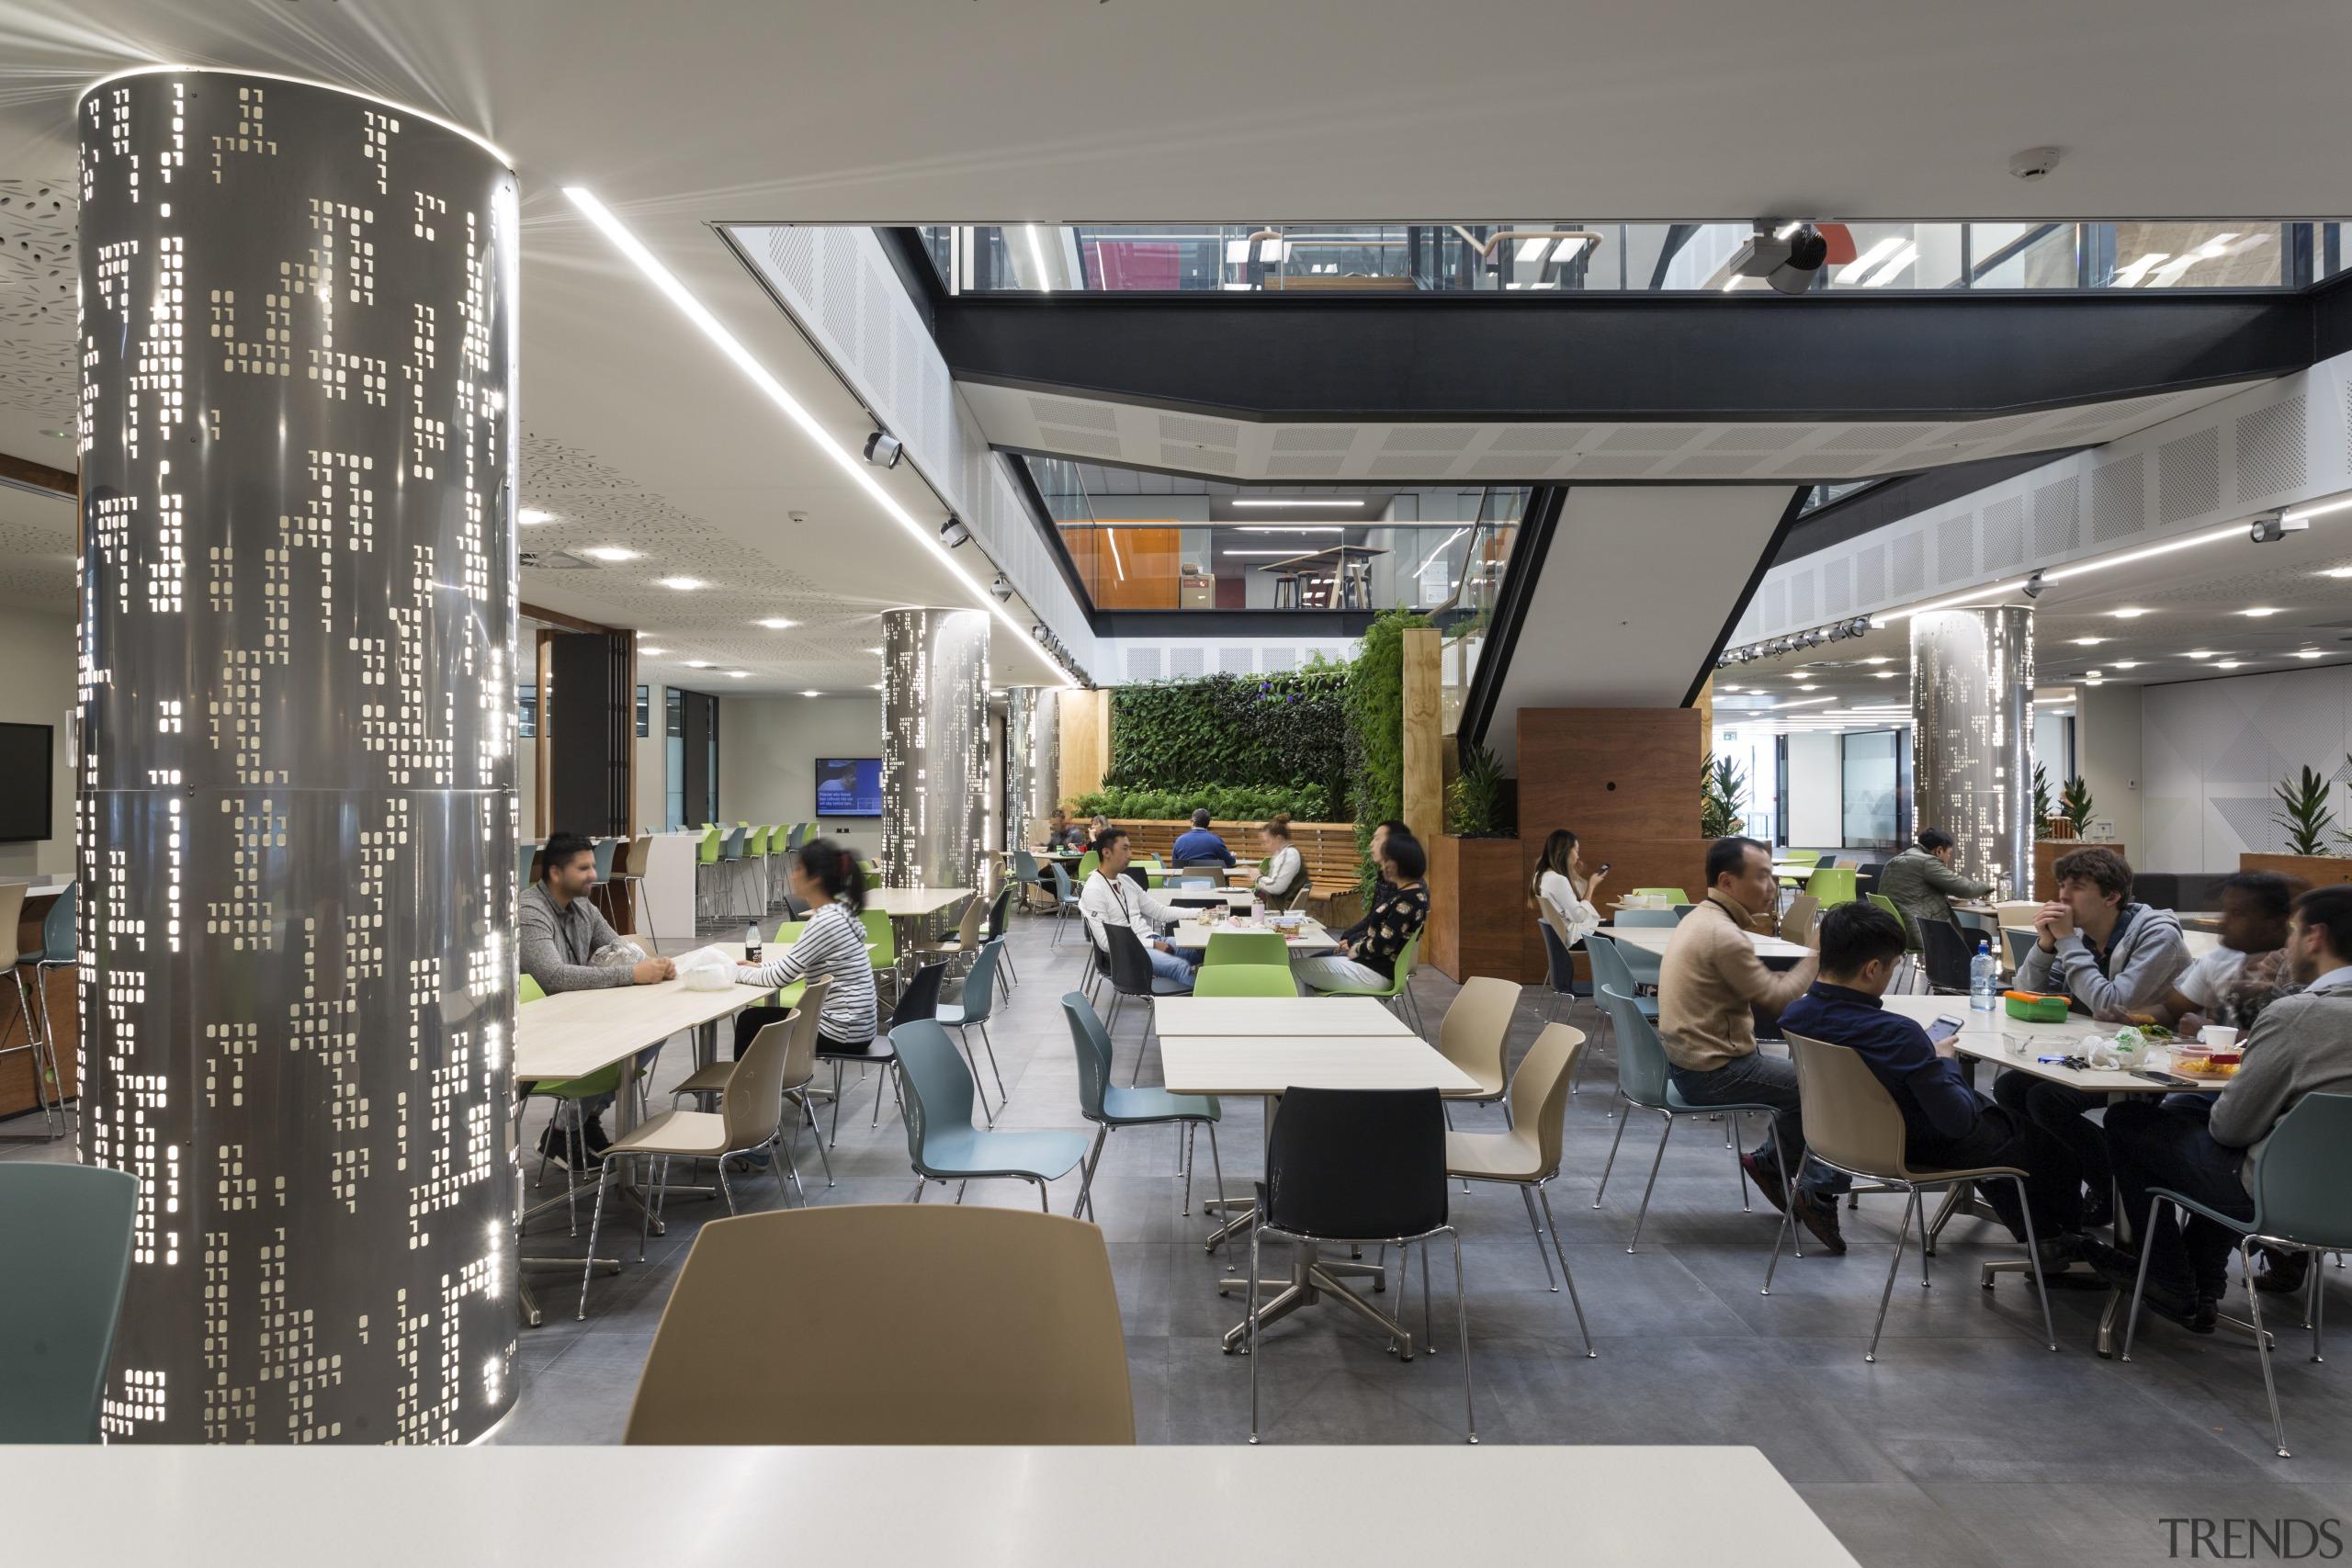 The soaring light-filled atrium of the Datacom building interior design, restaurant, gray